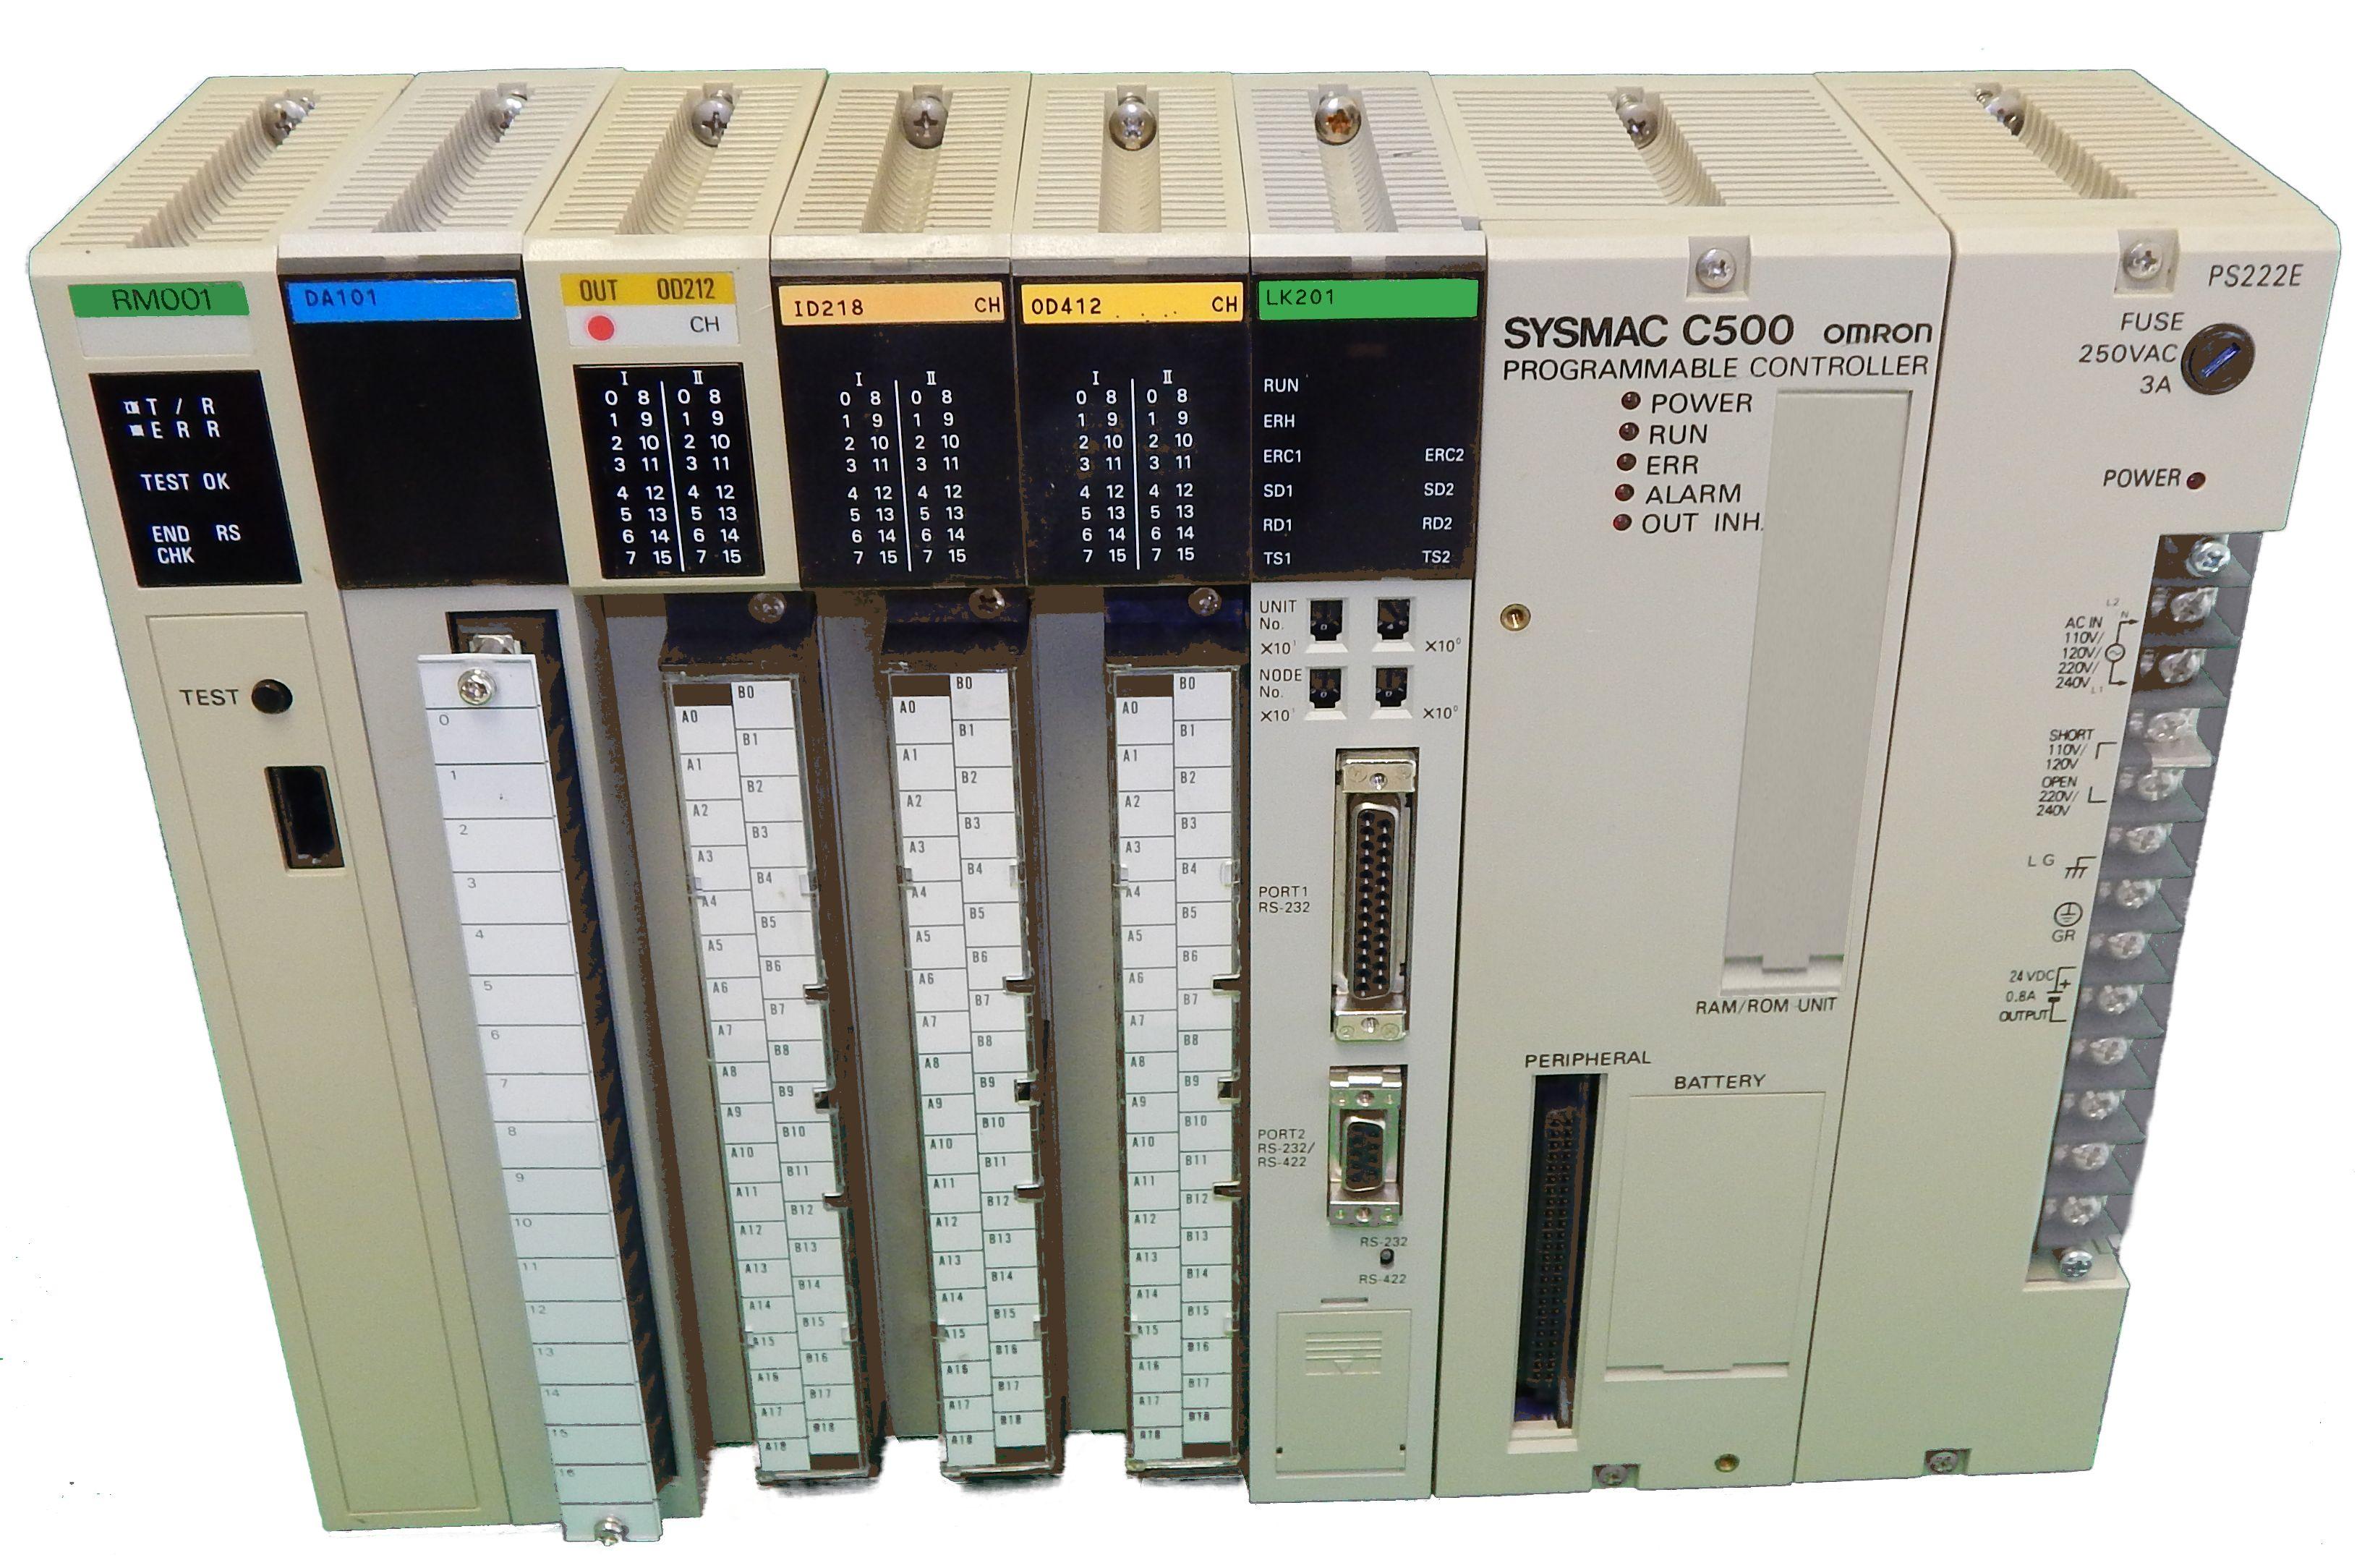 3G2C7-CPU84-E